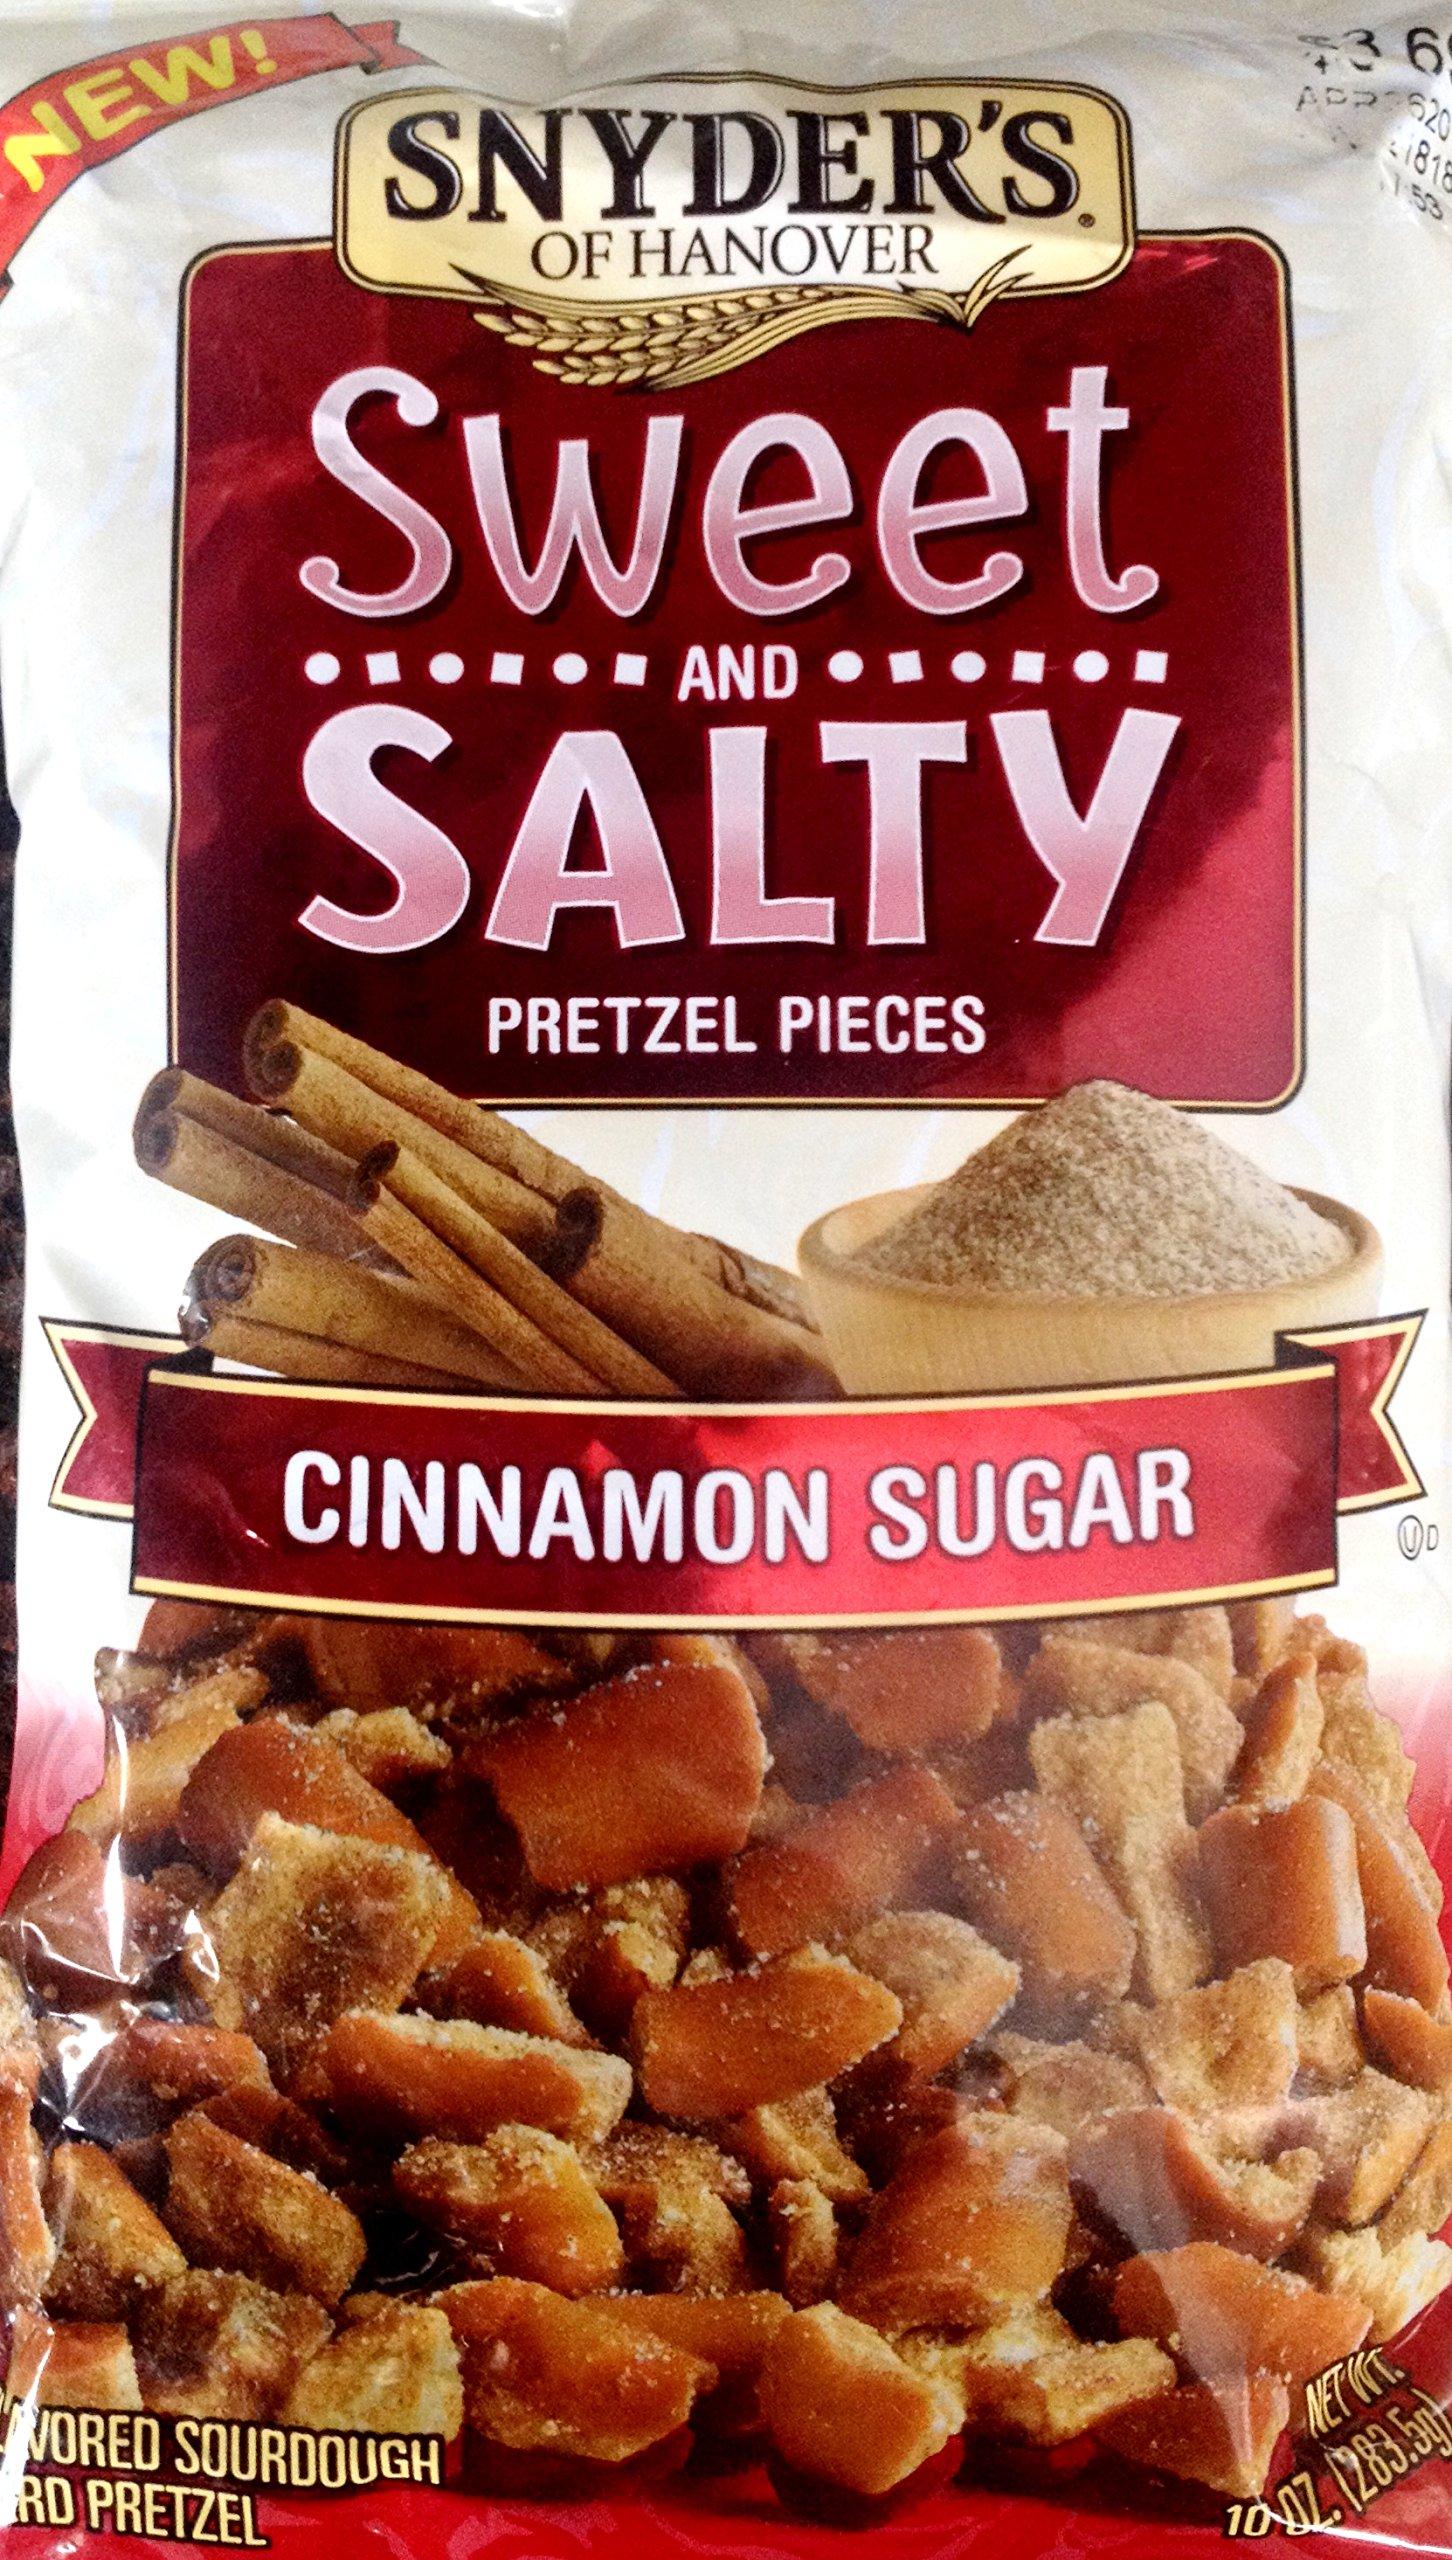 Snyder's SWEET & SALTY PRETZEL PIECES Cinnamon Sugar 10oz. (Pack of 8)